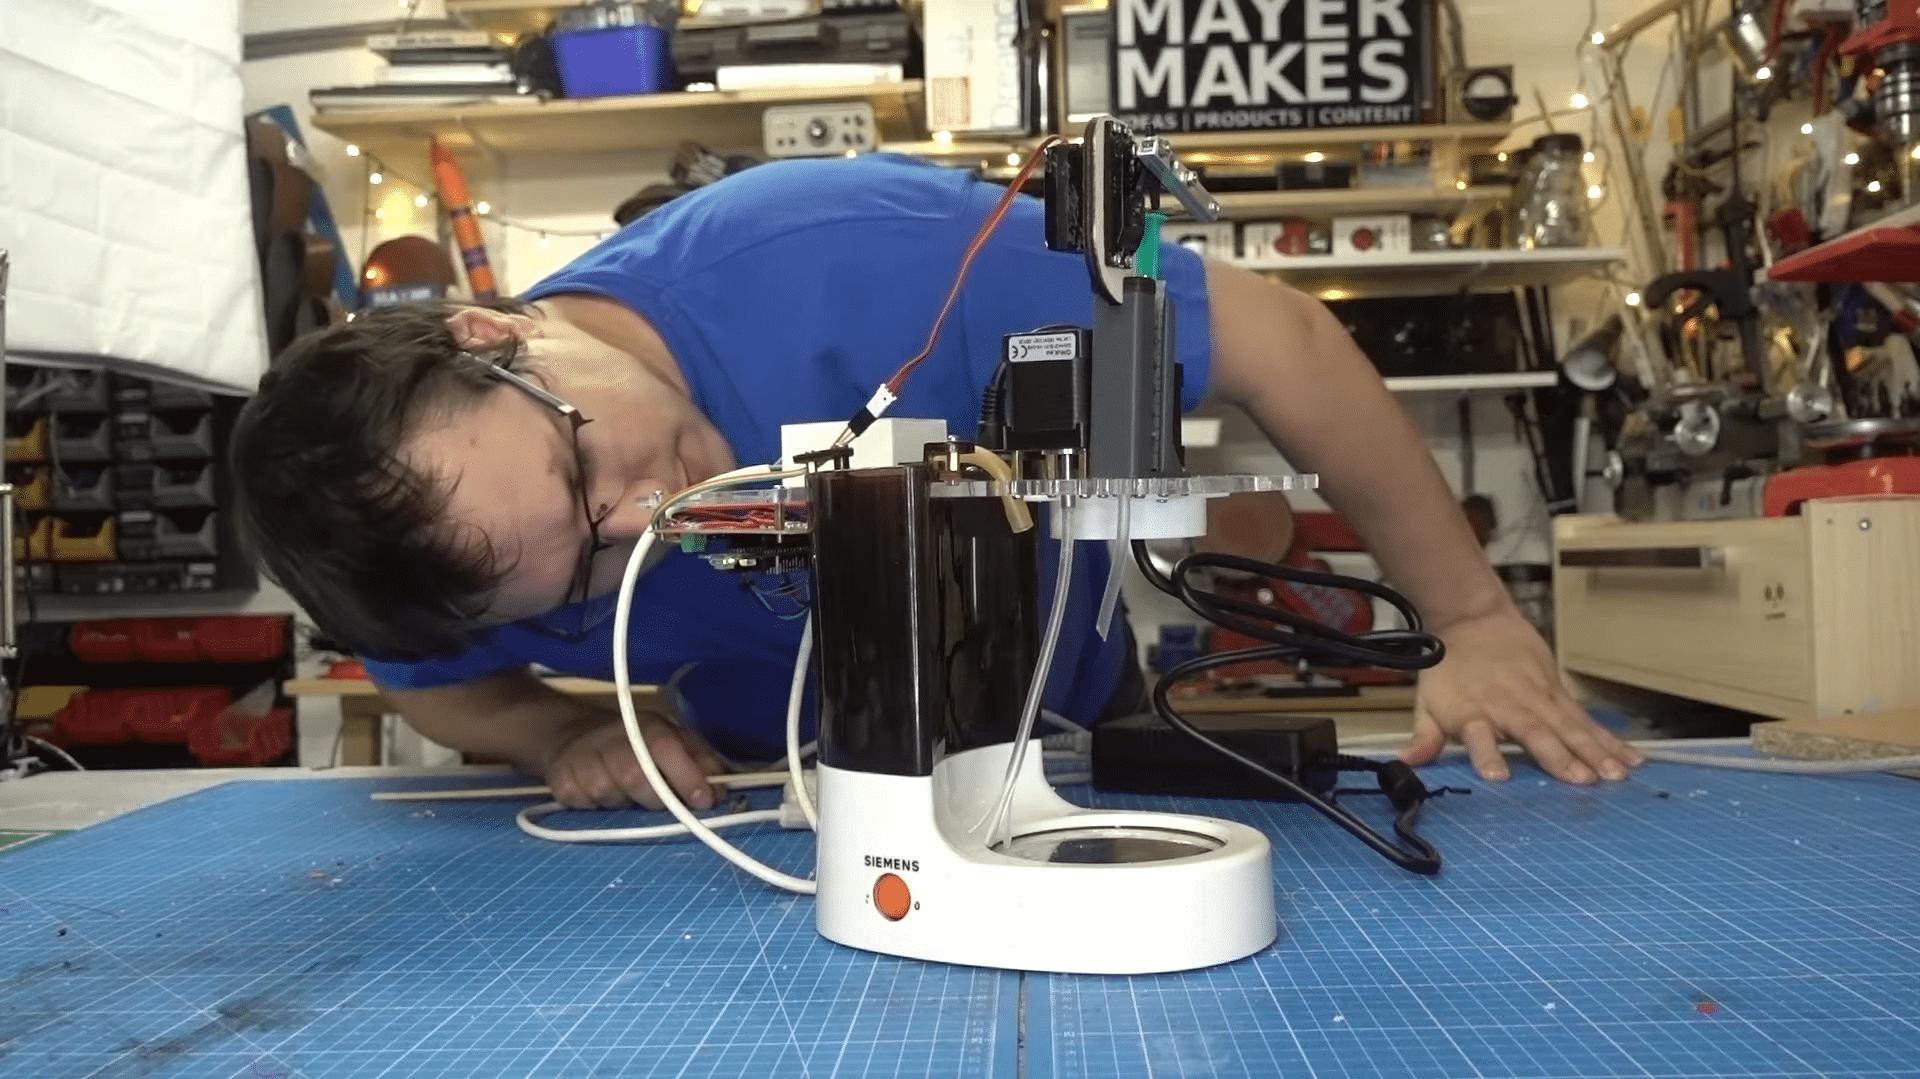 Umgebaute Kaffeemaschine mit viel Elektronik.